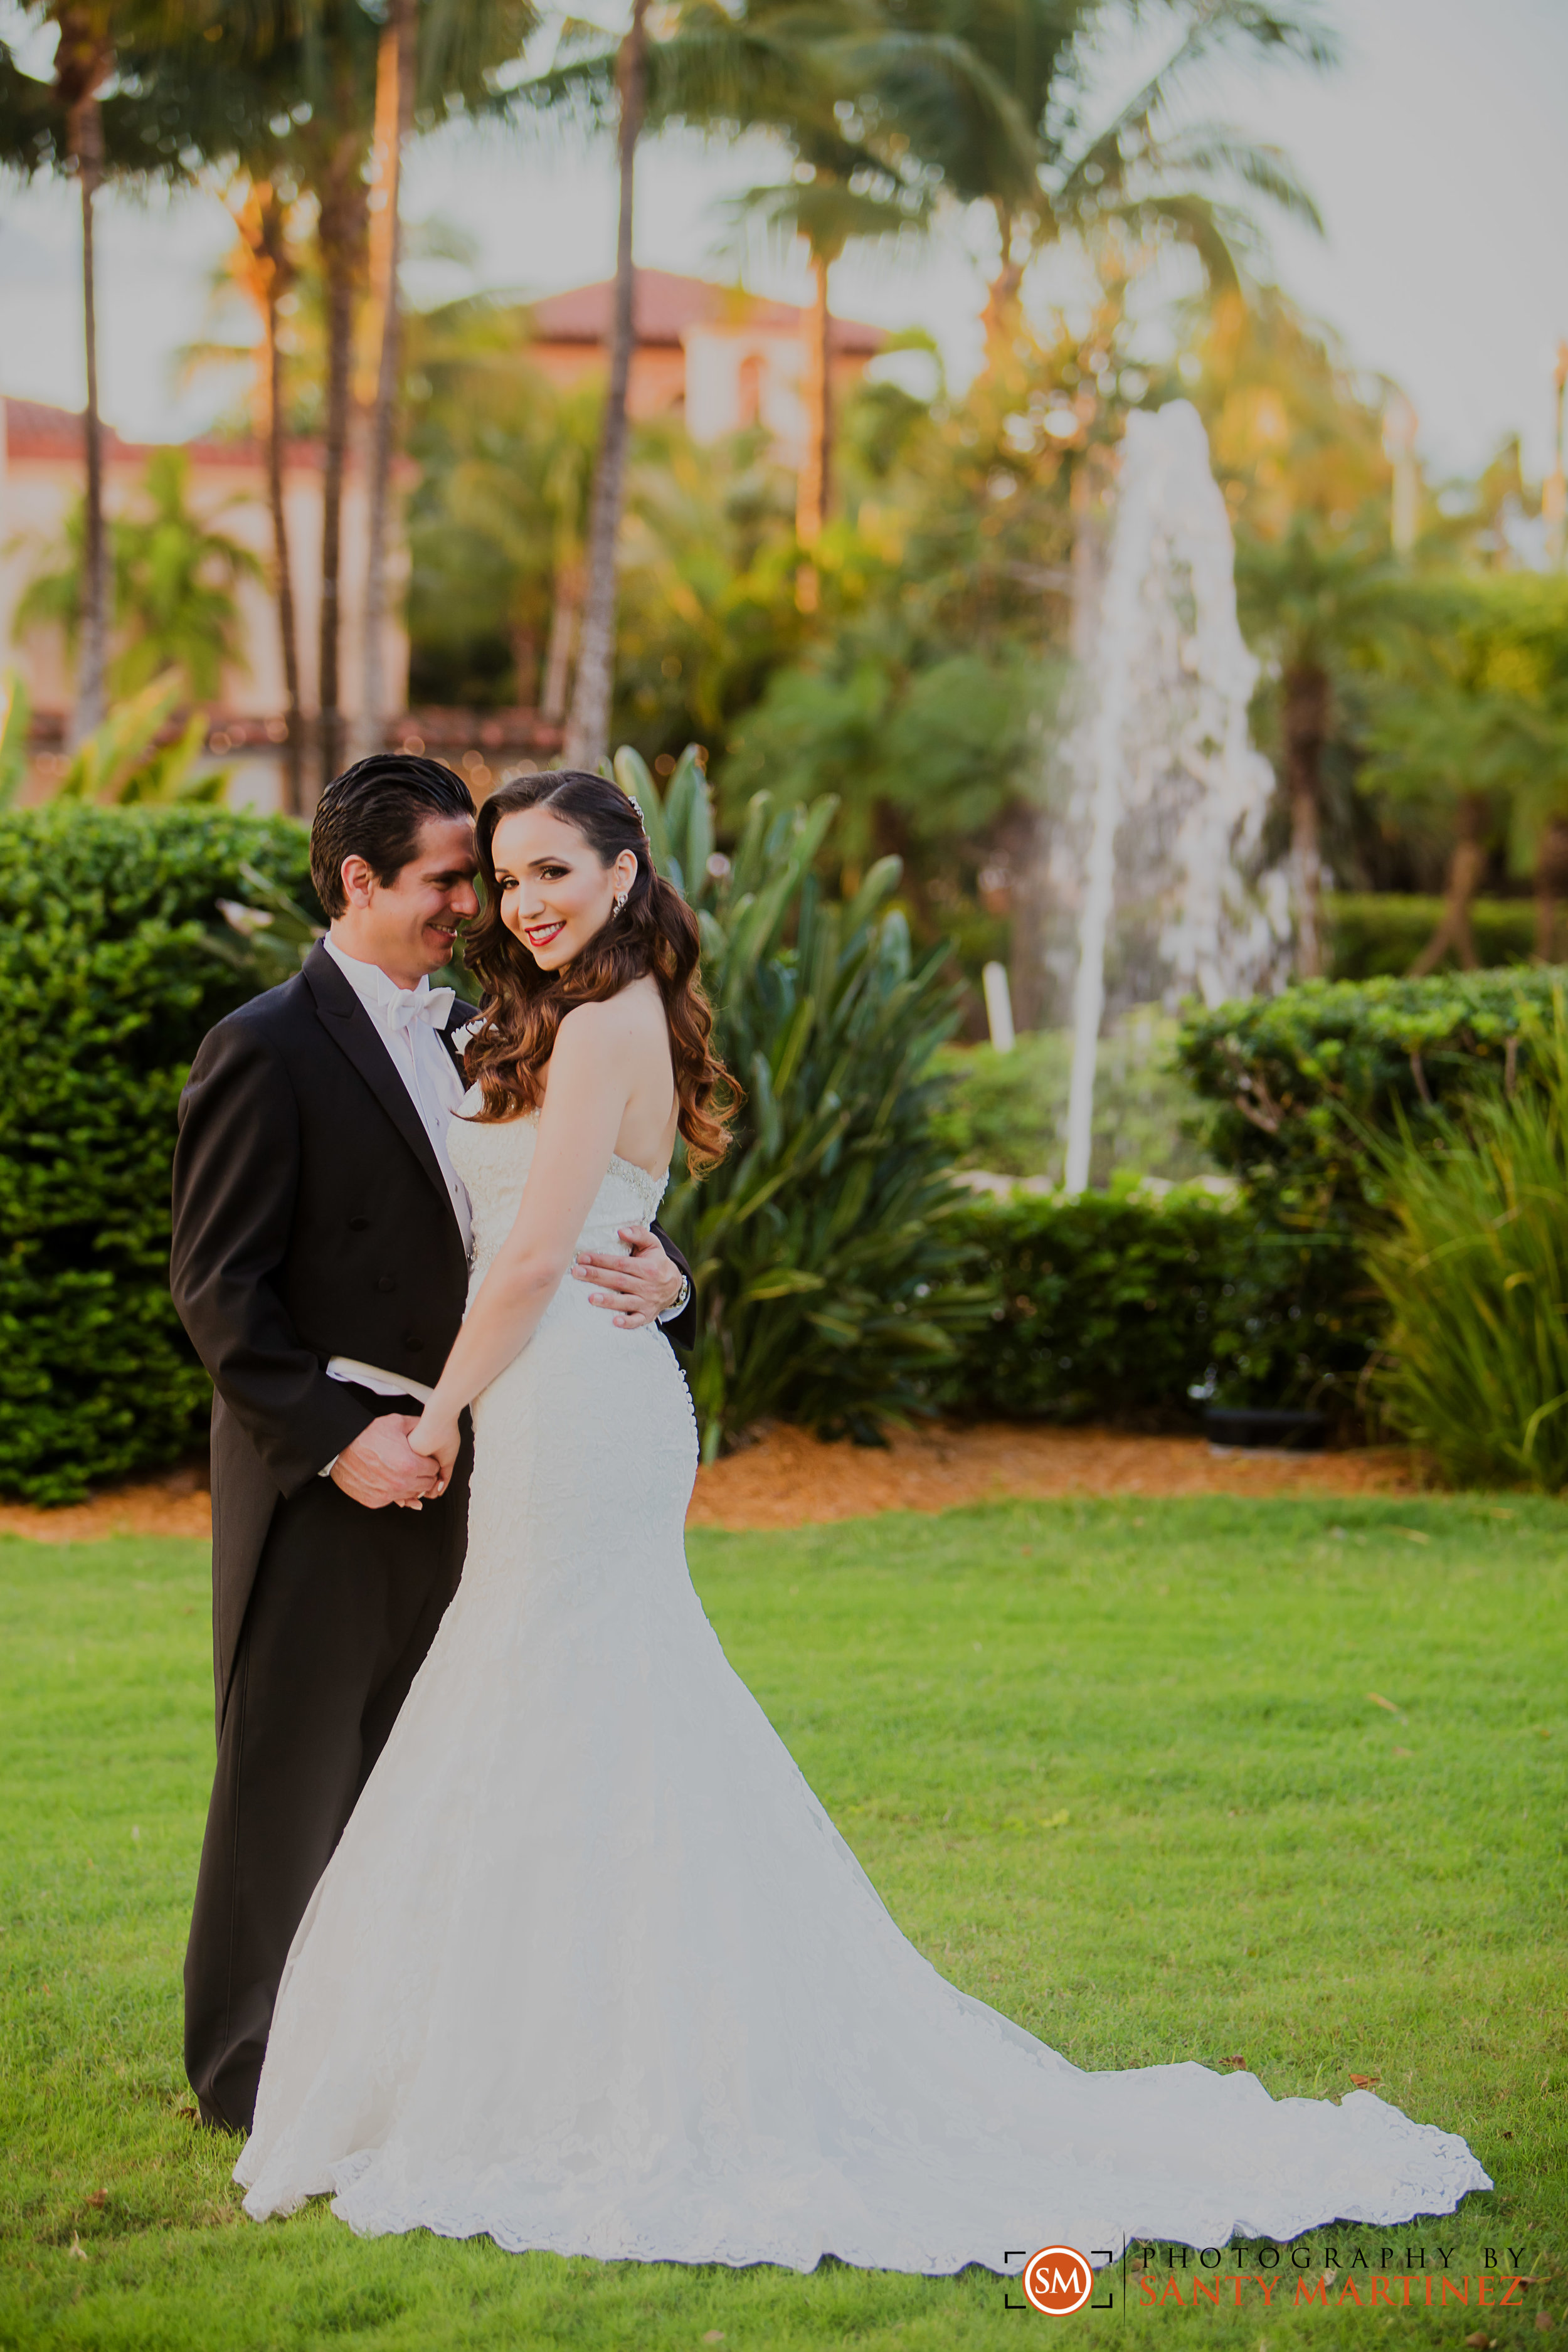 Miami Wedding Photographer - Santy Martinez-24.jpg